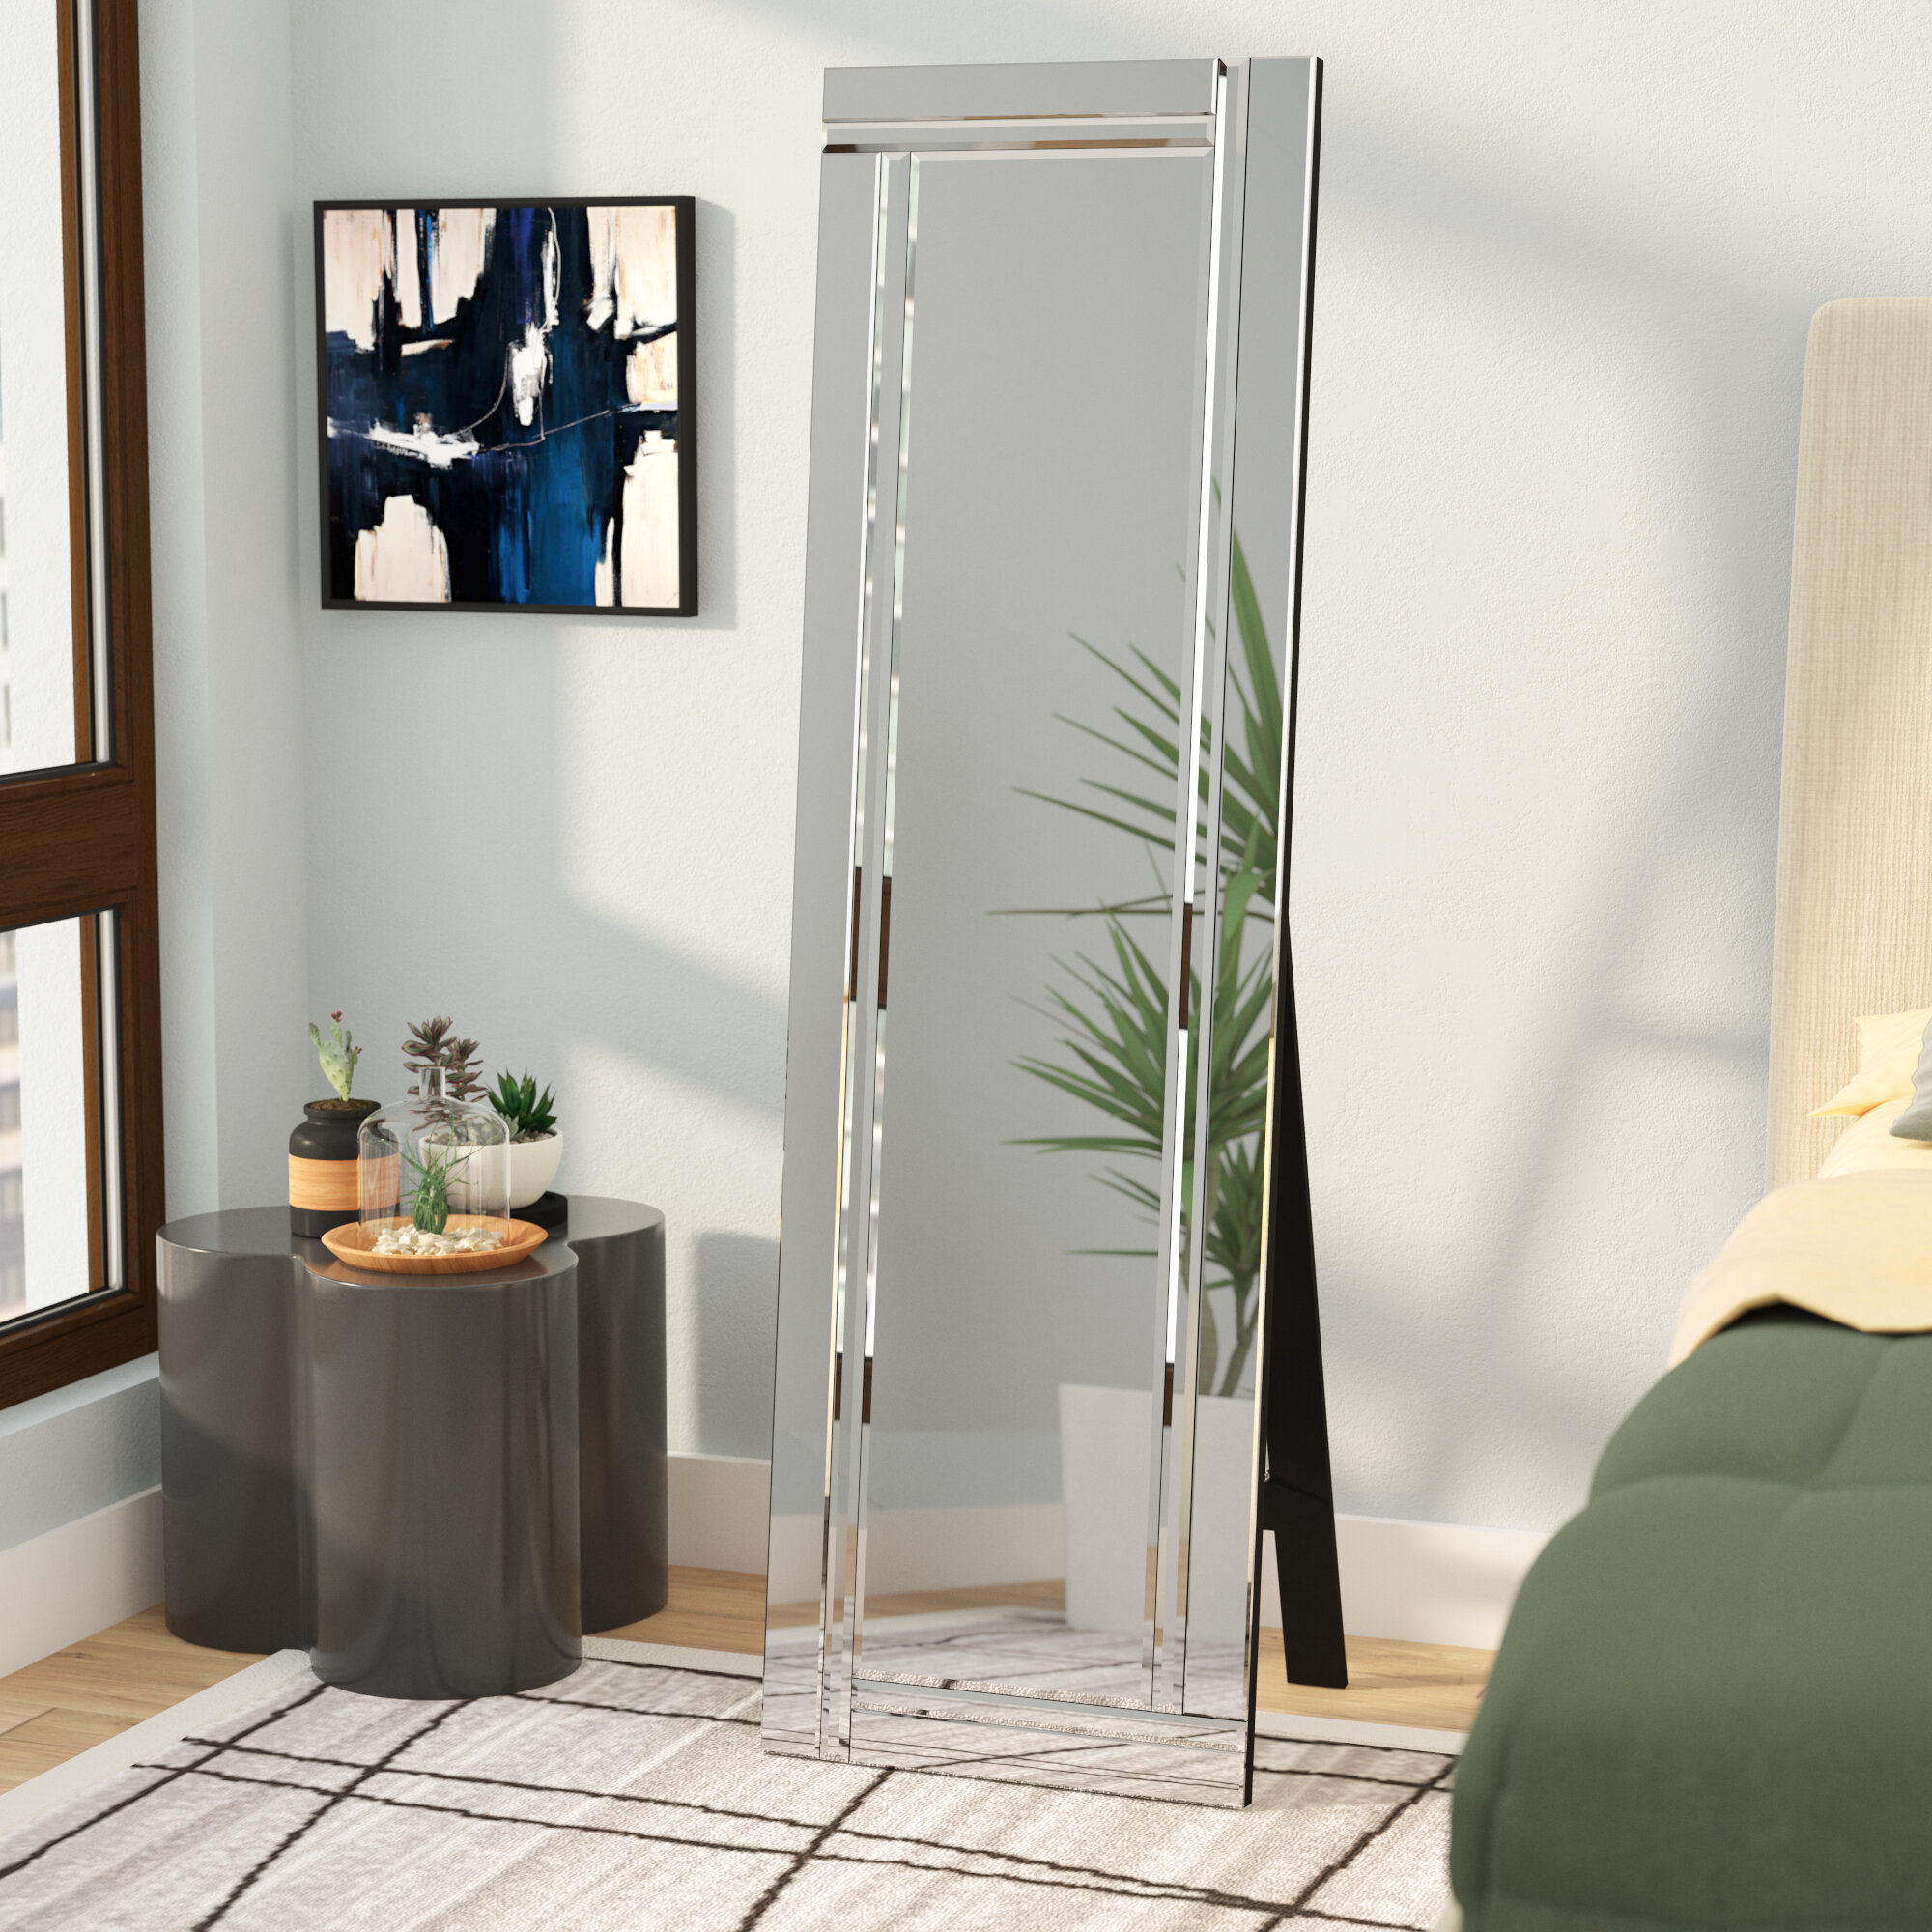 office large size floor clocks wayfair. Office Large Size Floor Clocks Wayfair 0